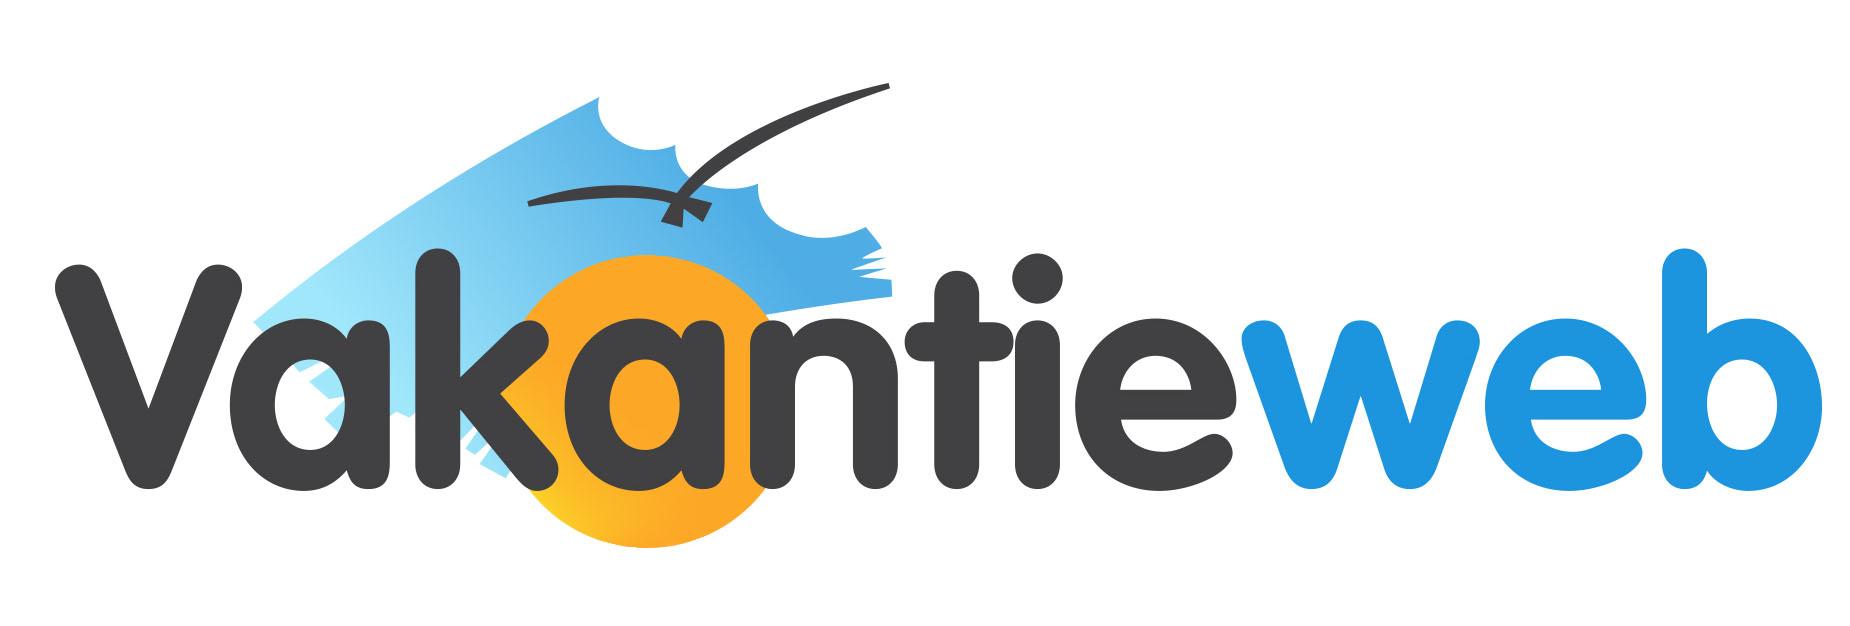 logo Vakantieweb